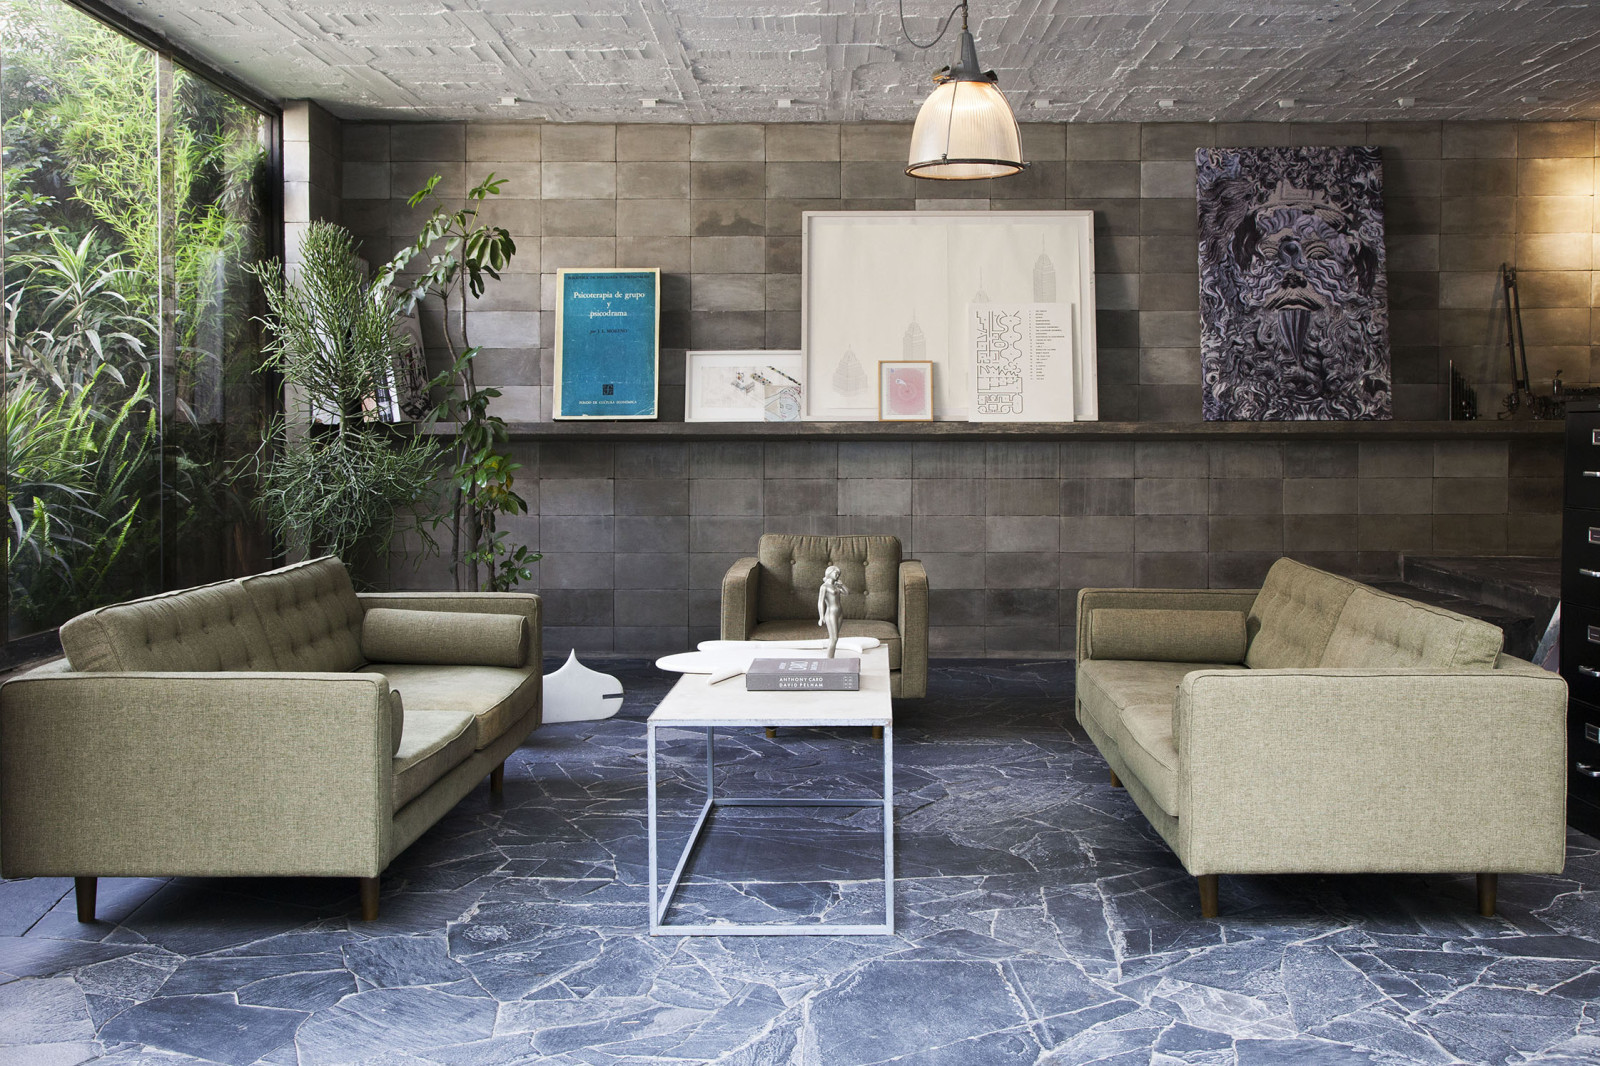 Building Beauty From Brutalism Pedro Reyes And Carla Fern 225 Ndez Freunde Von Freunden